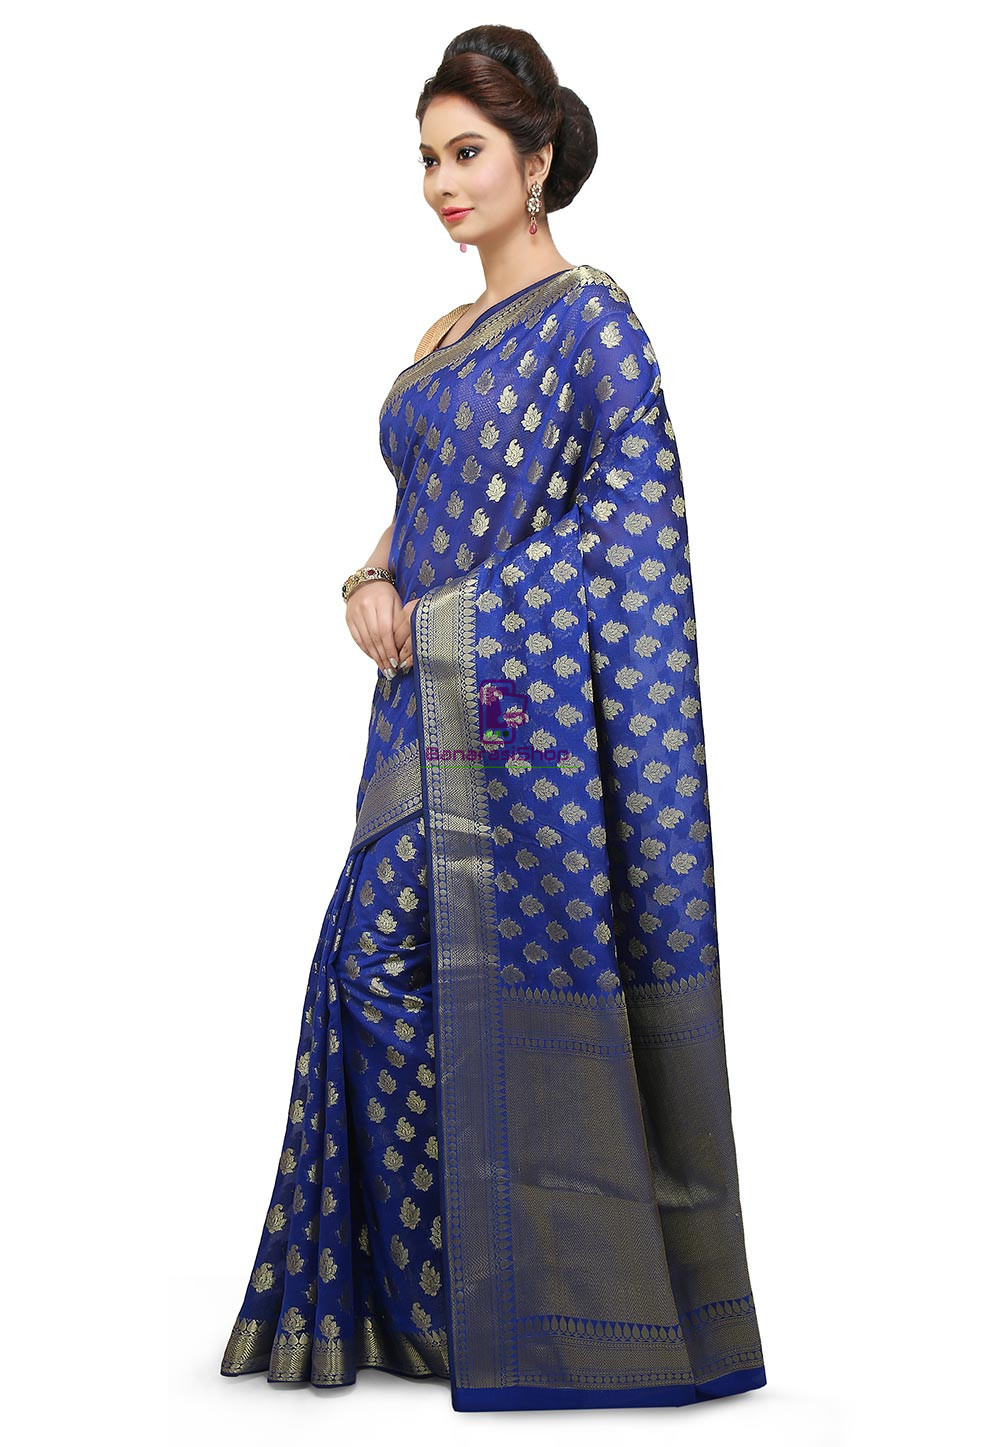 Banarasi Saree in Royal Blue 5